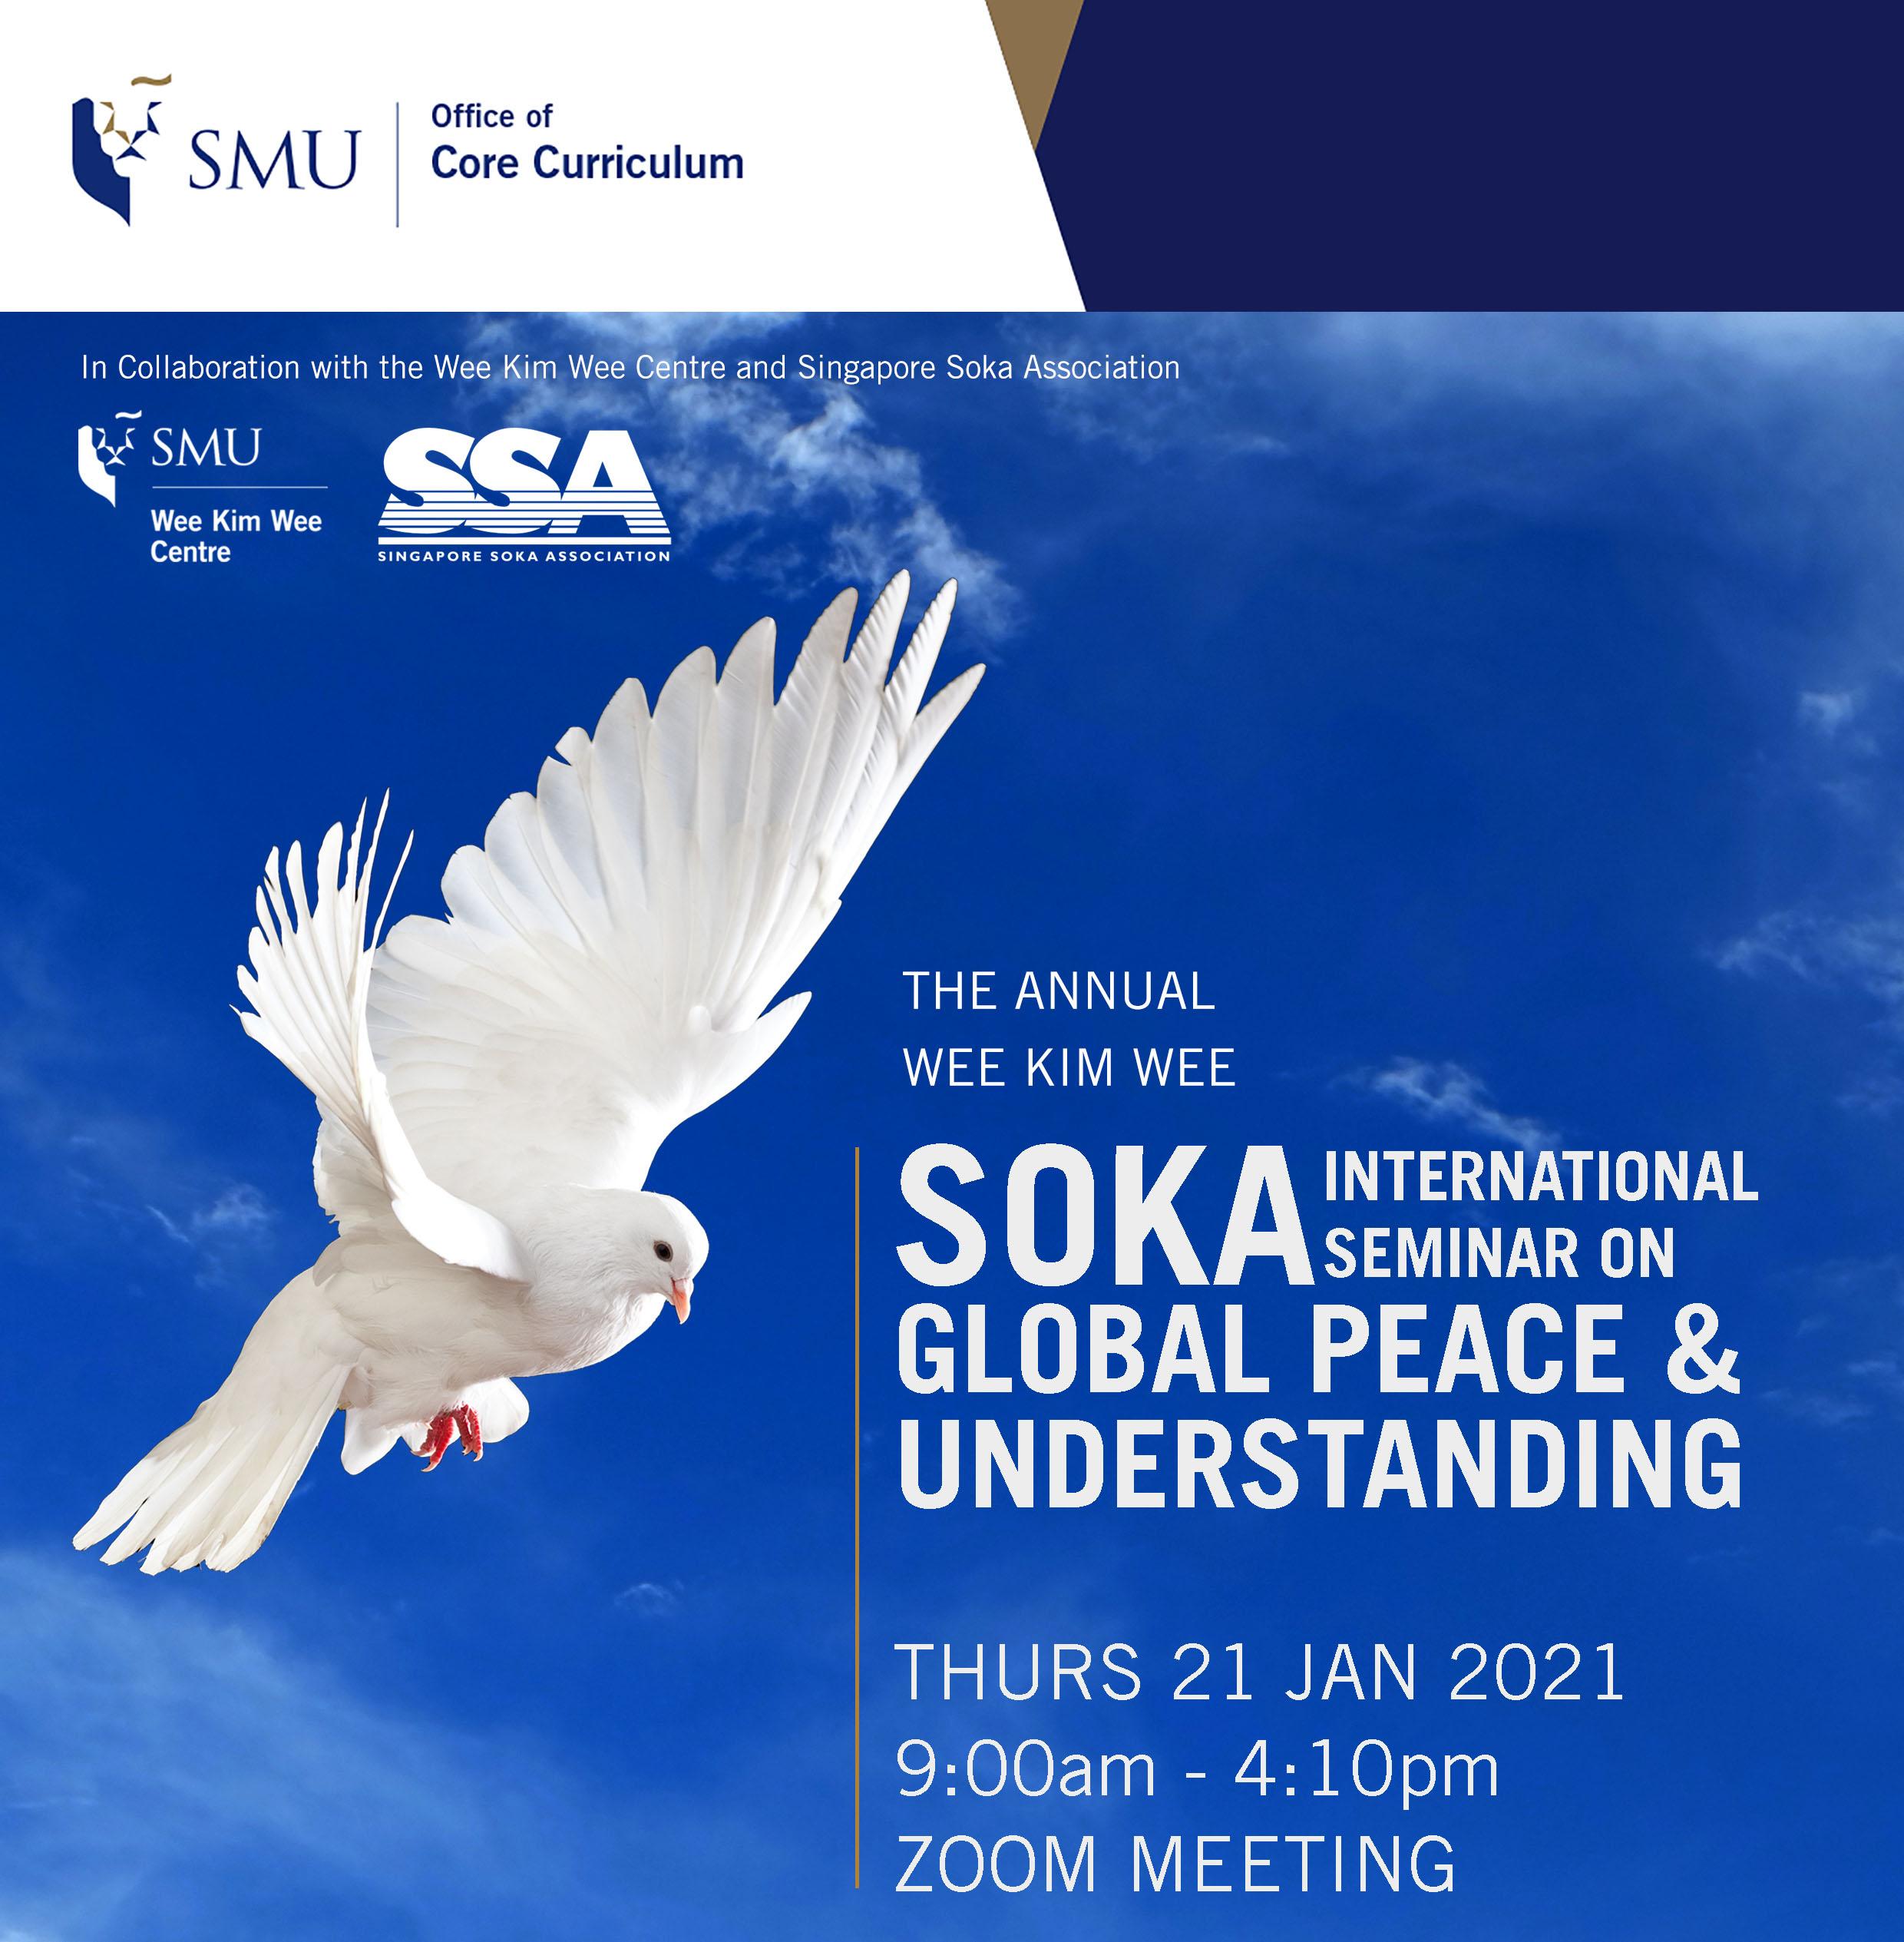 The Annual Wee Kim Wee Soka International Seminar on Global Peace and Understanding